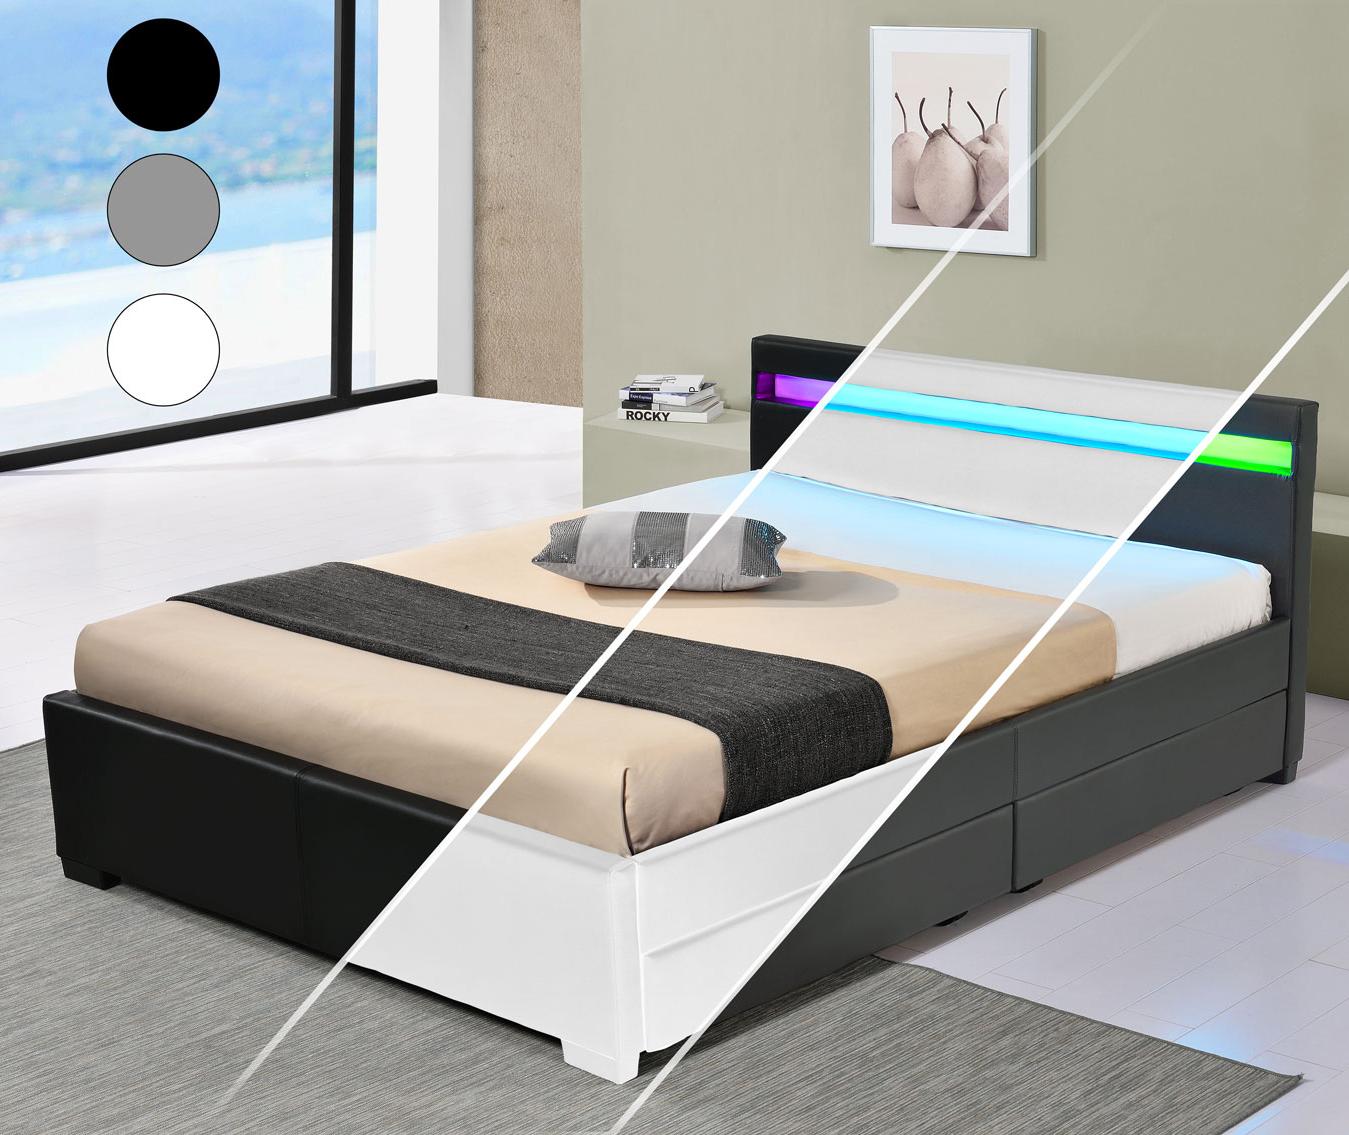 2er set dekotablett holztablett kerzentablett. Black Bedroom Furniture Sets. Home Design Ideas